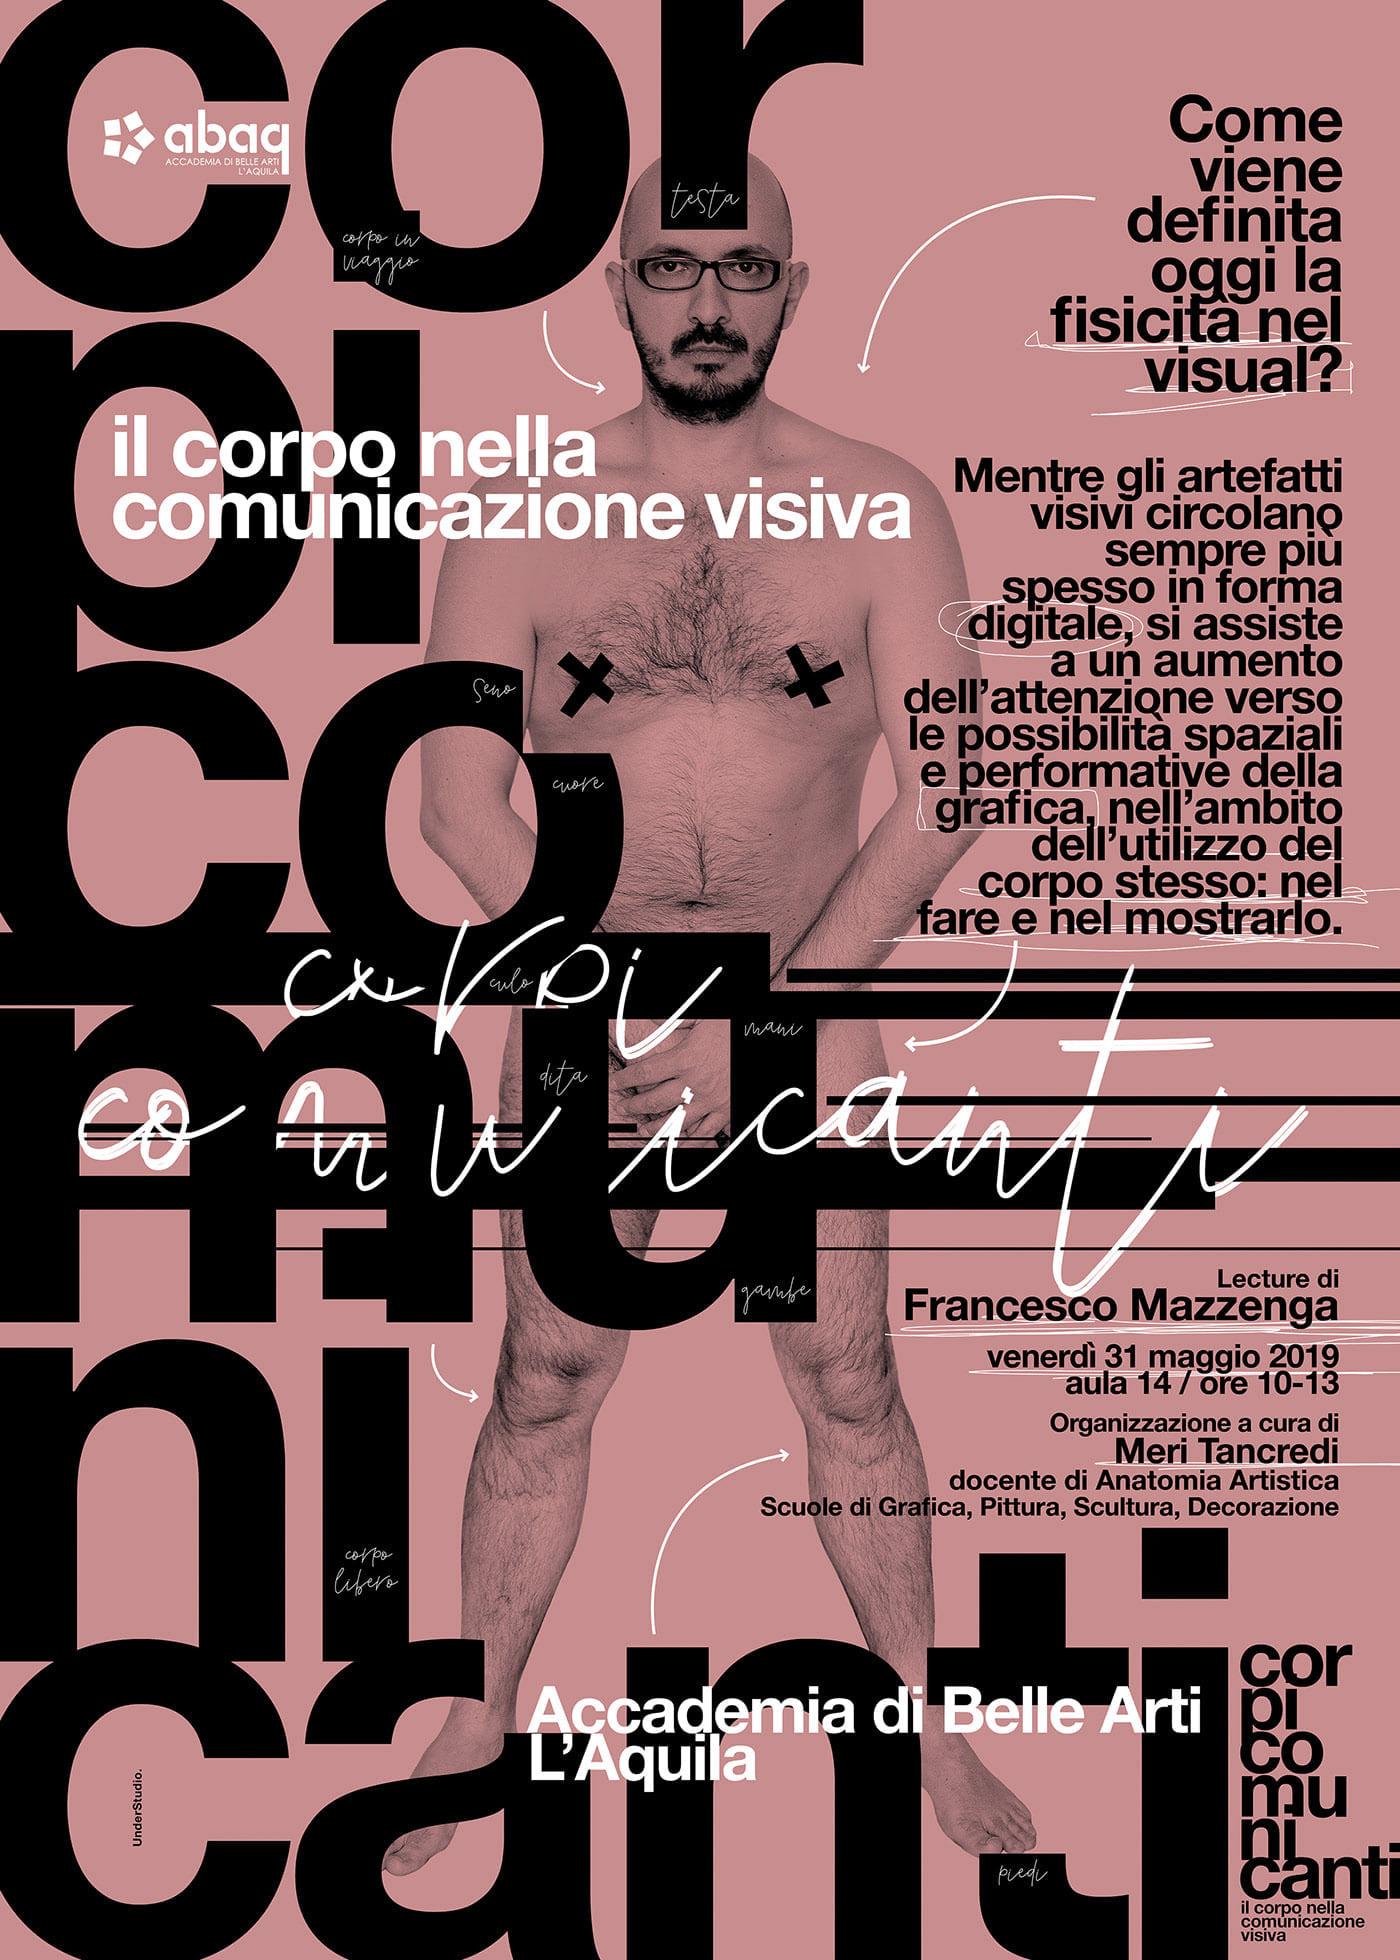 Exhibition  Francesco Mazzenga graphic design  Photography  poster posterdesign